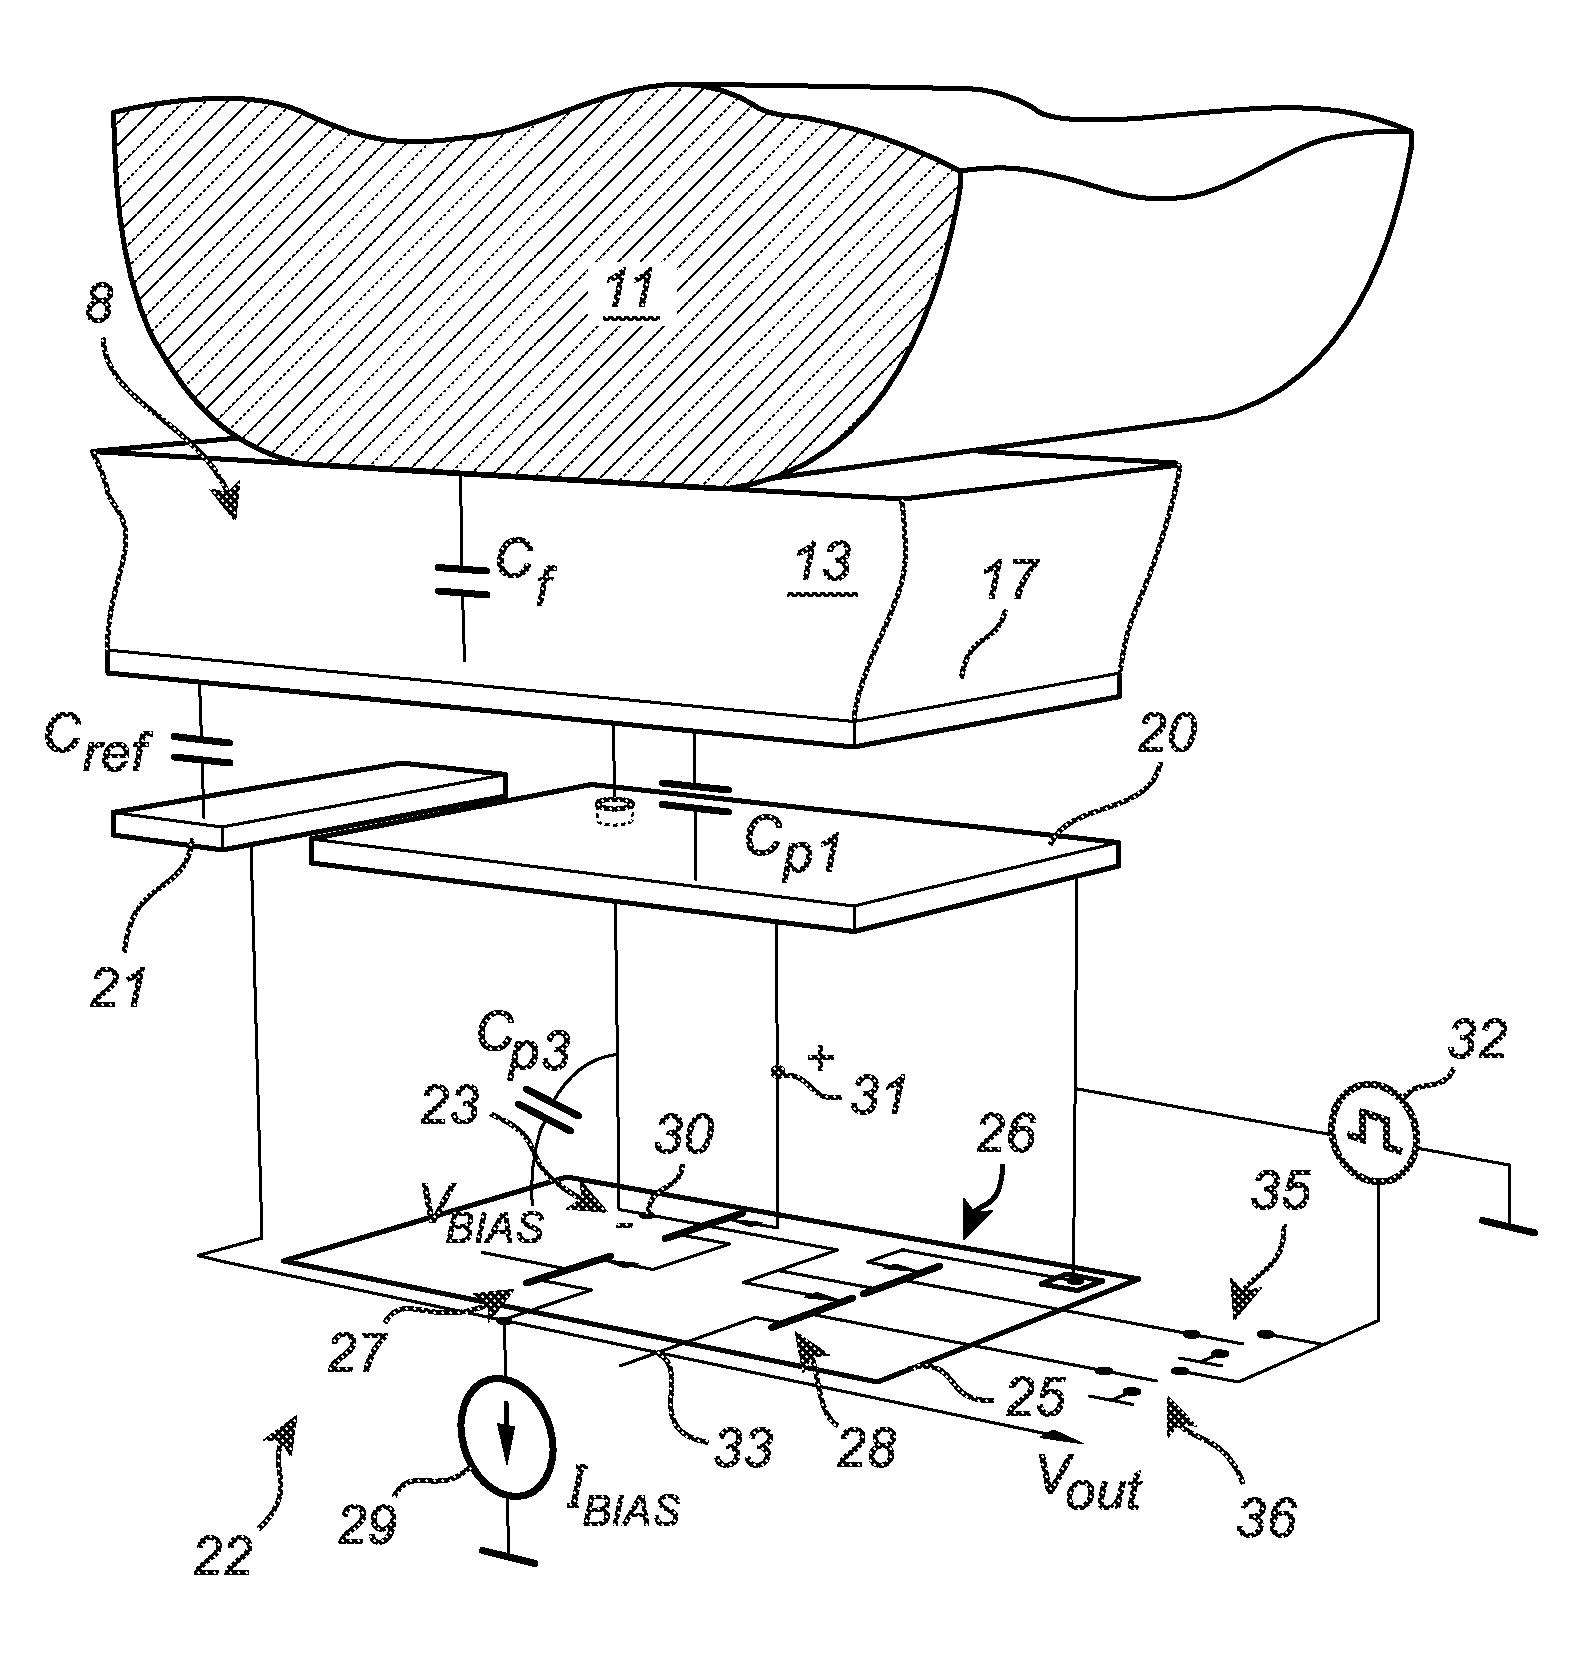 Patent US 9,152,841 B1